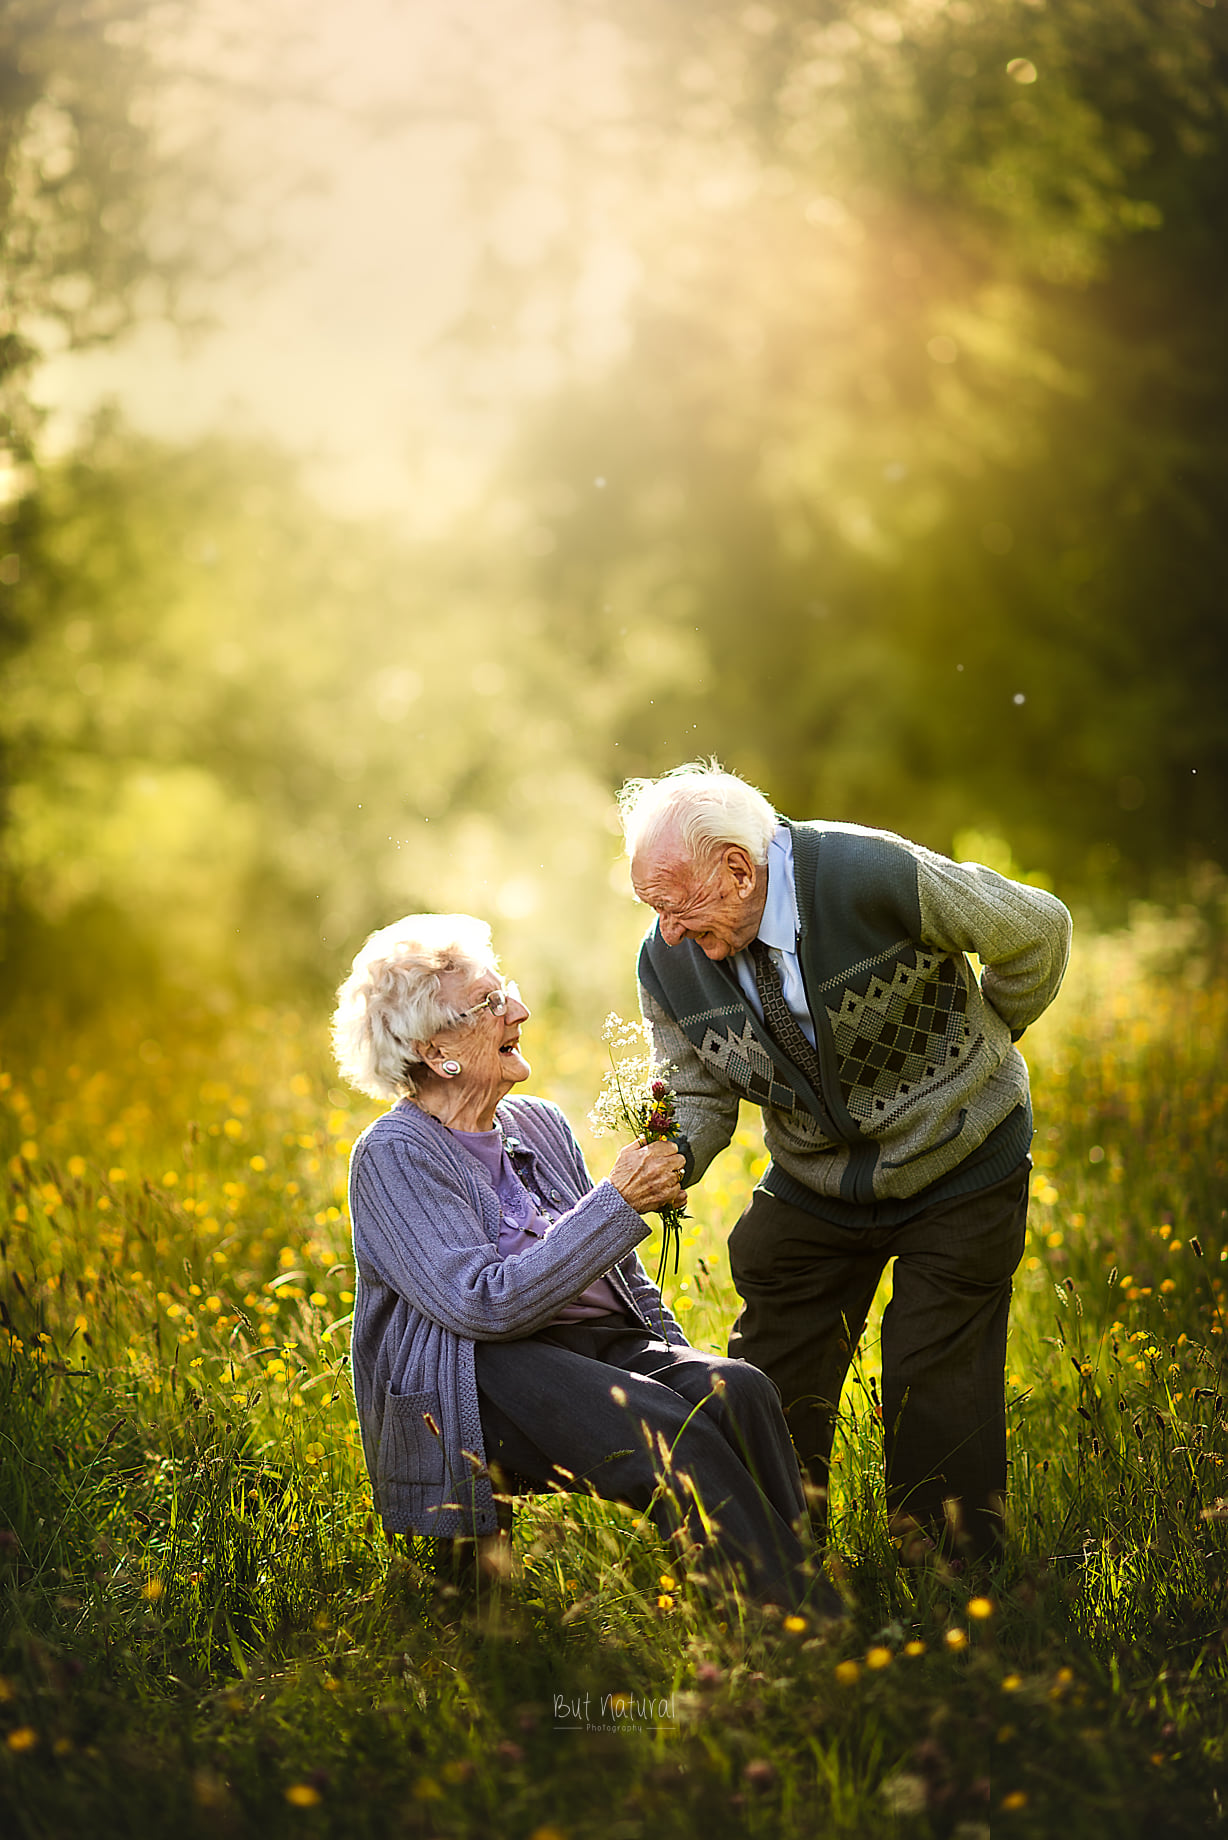 Senior romance | Elderly Photoshoot by Sujata Setia - But Natural Photography